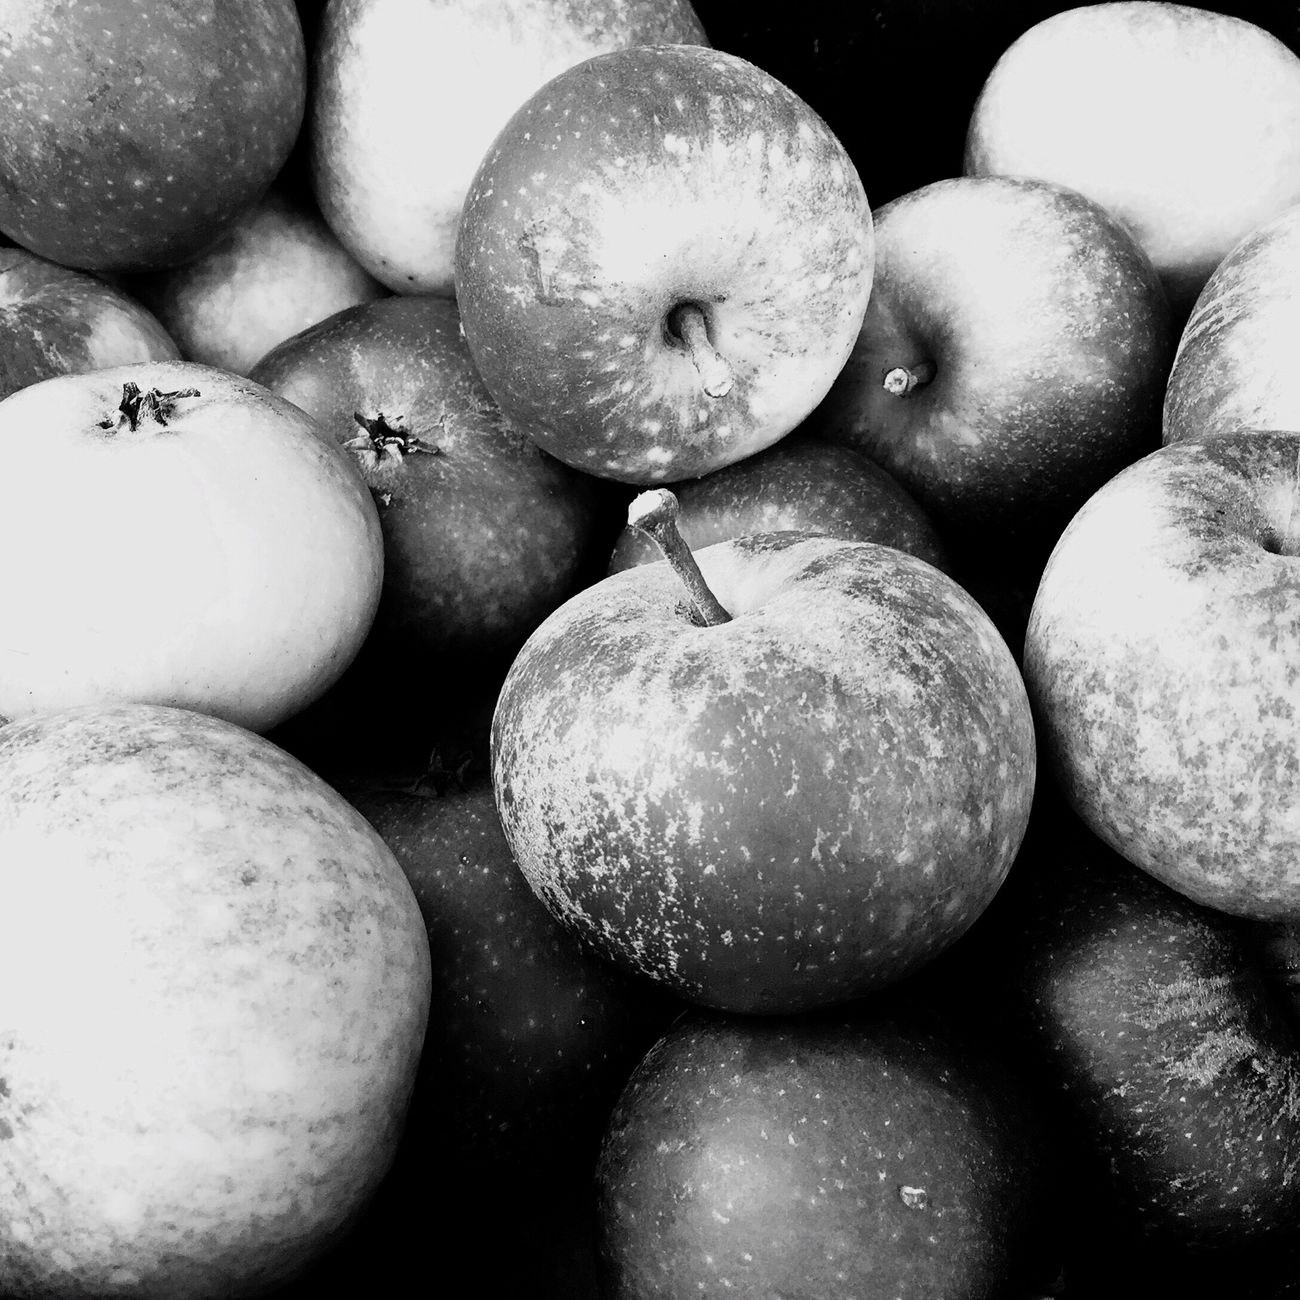 Apples Manzanas